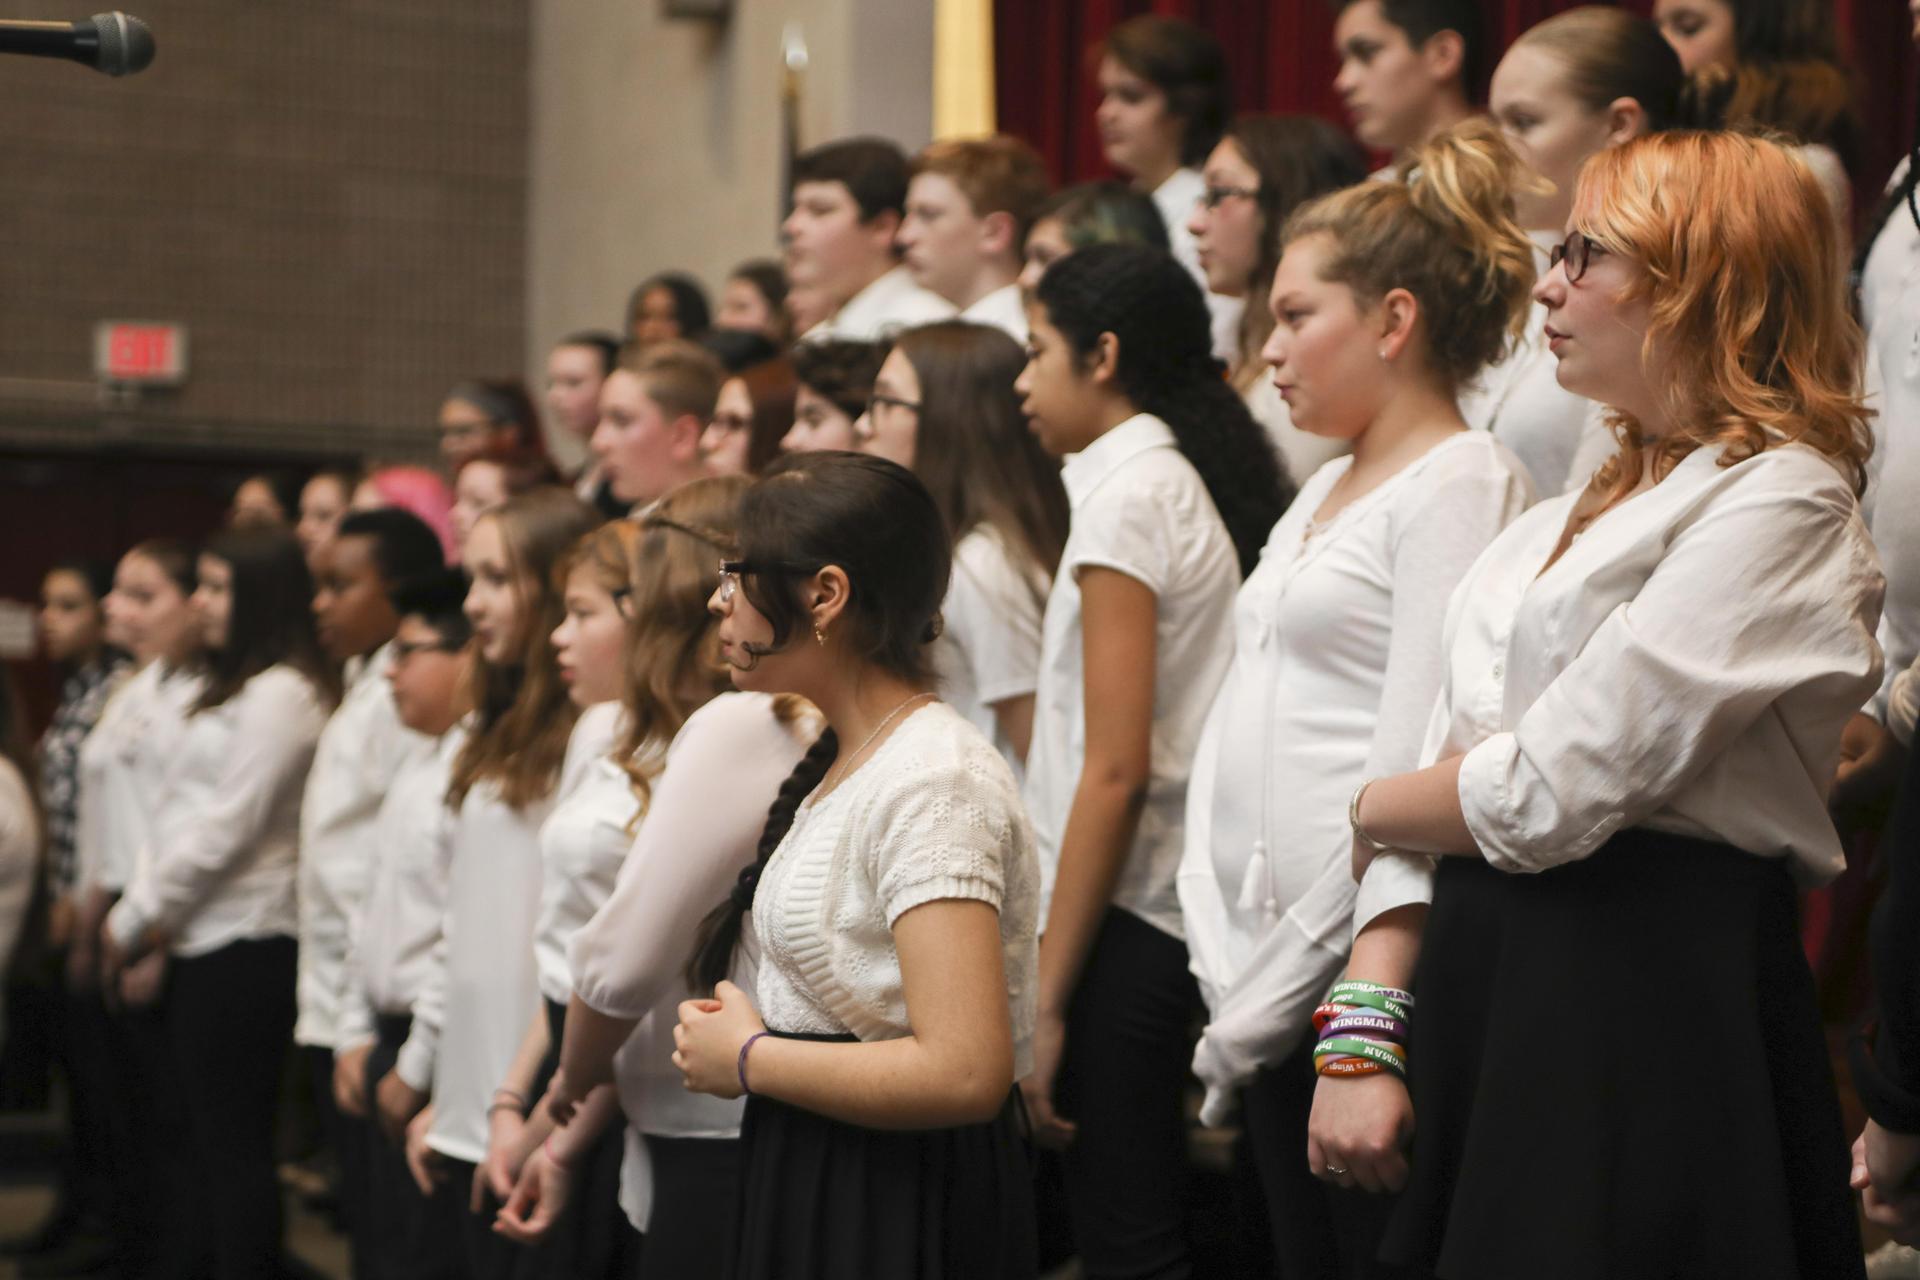 Students music performance